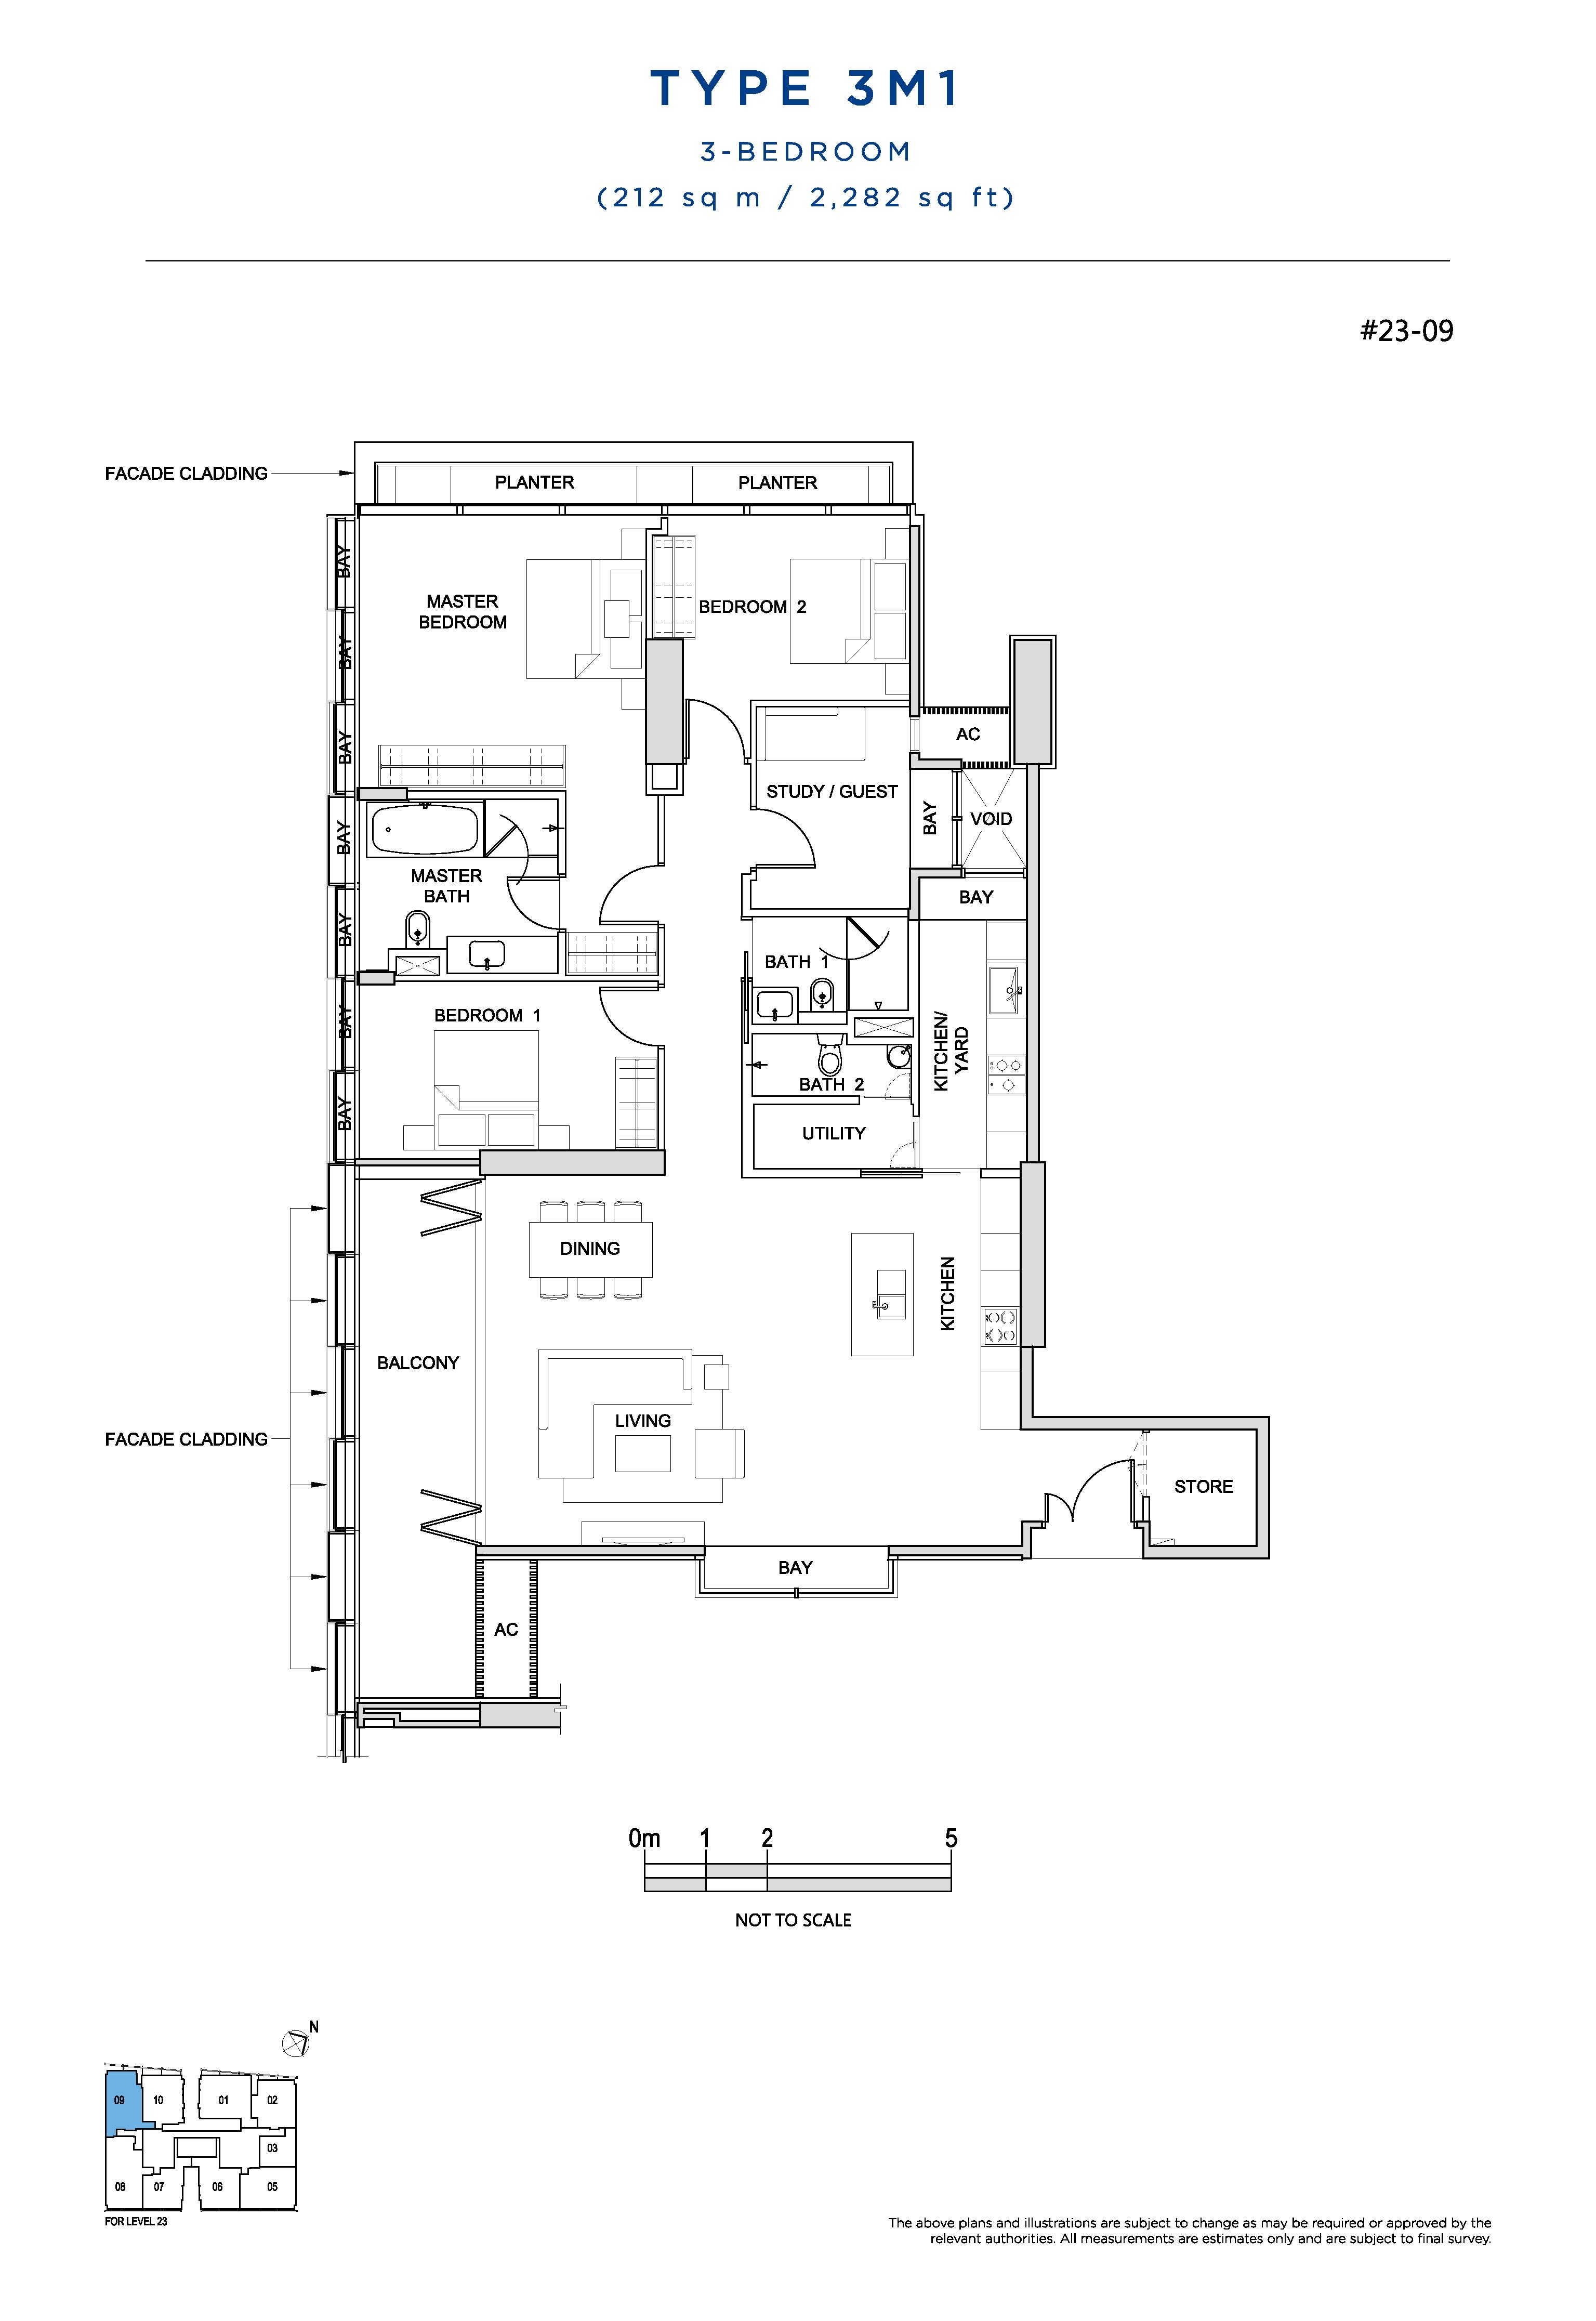 South Beach Residences 3 Bedroom Floor Plans Type 3M1